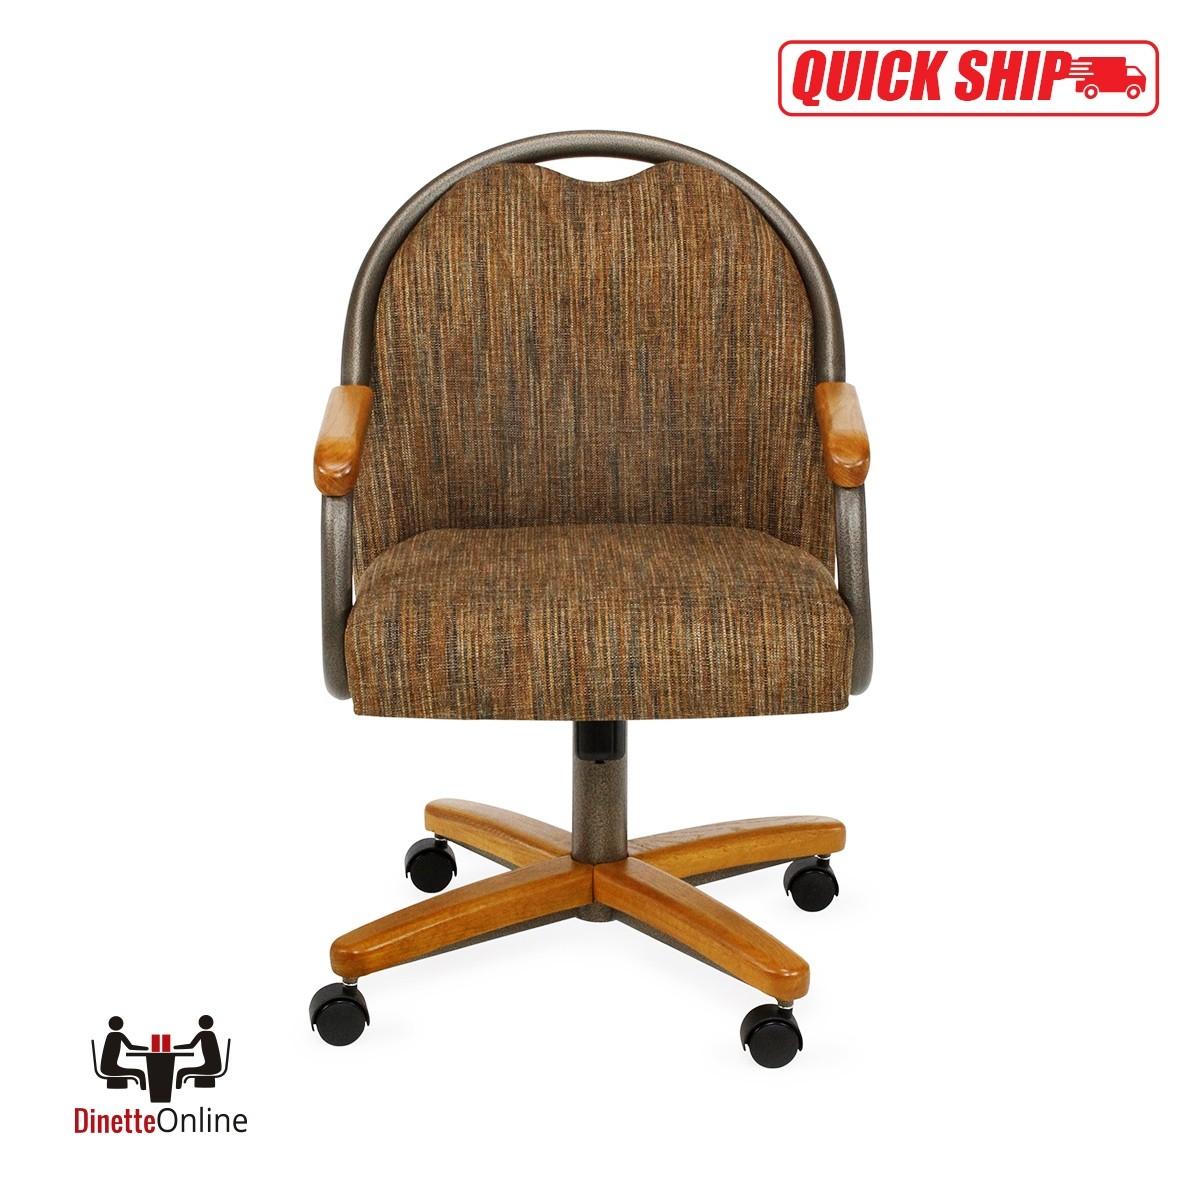 Chromcraft Quick Ship C188 935 Swivel Tilt Caster Chairs